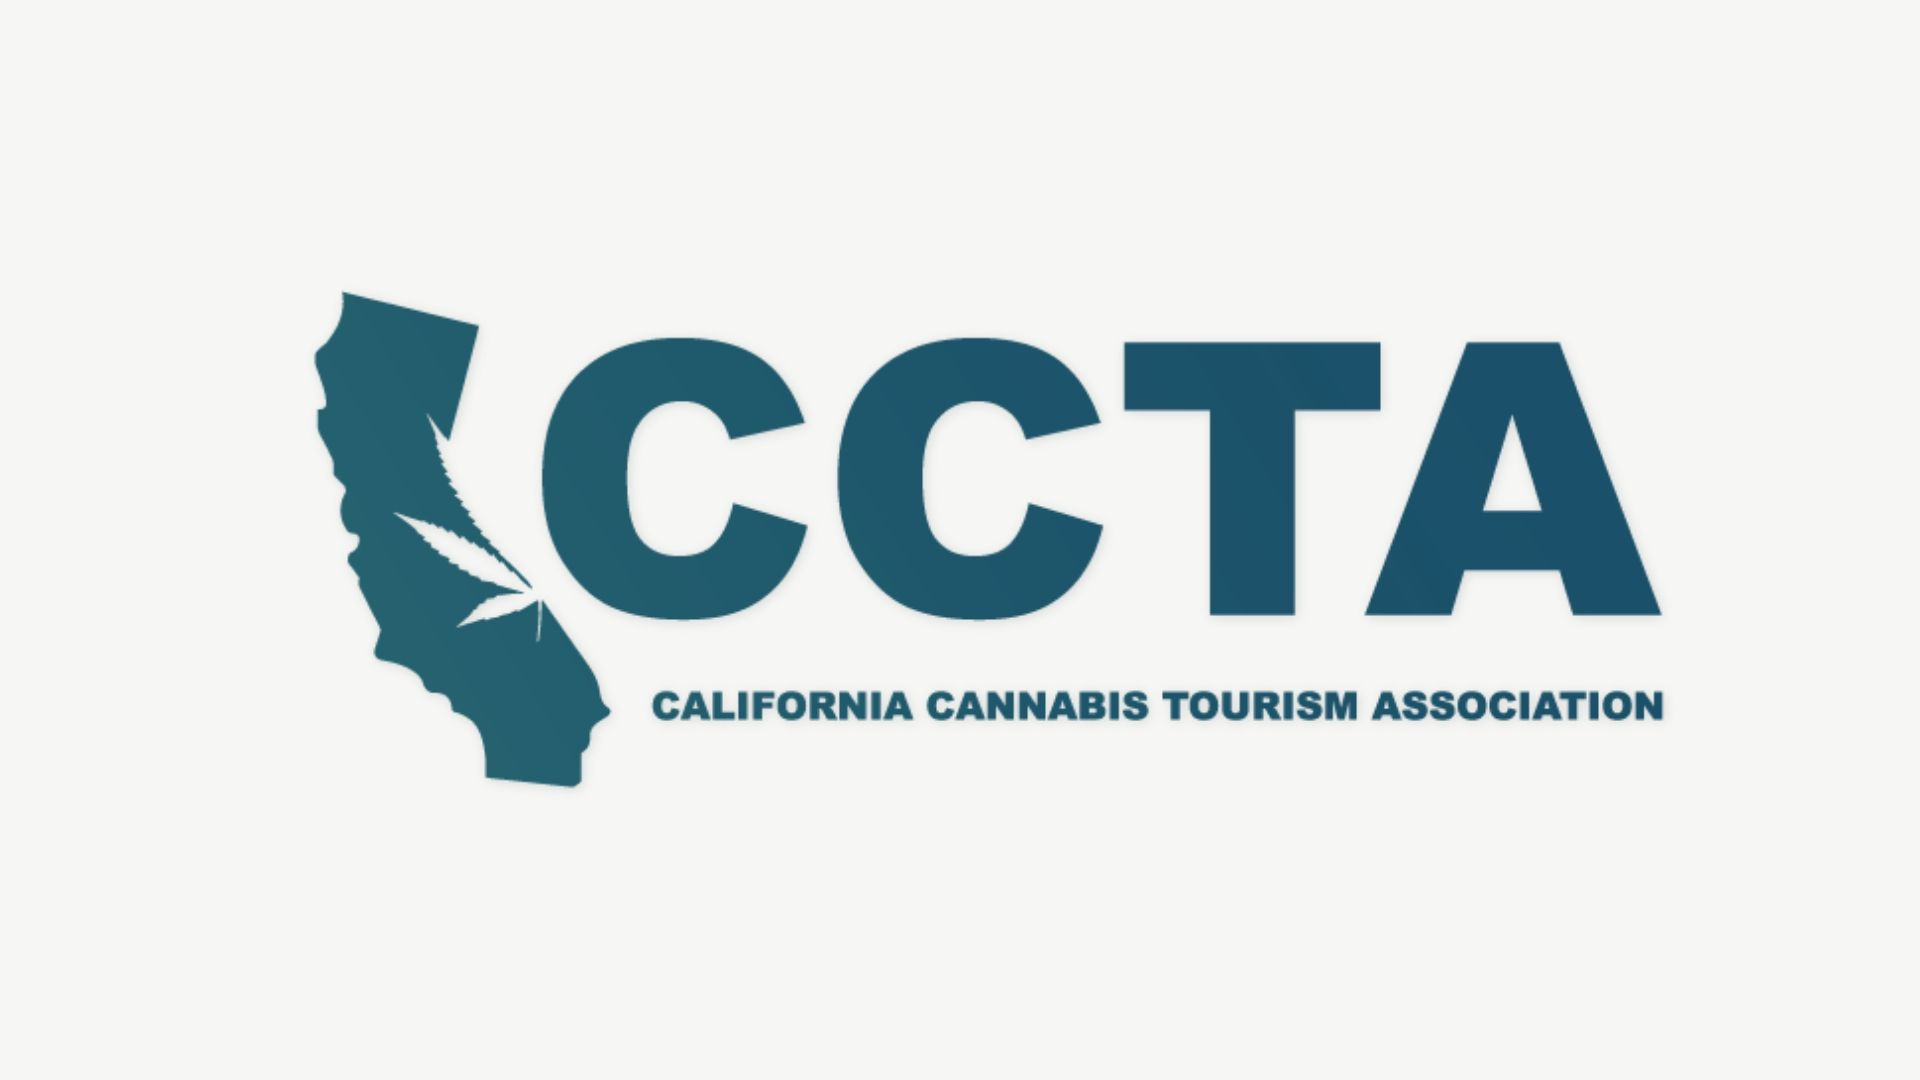 California Cannabis Tourism Association Virtual Meeting